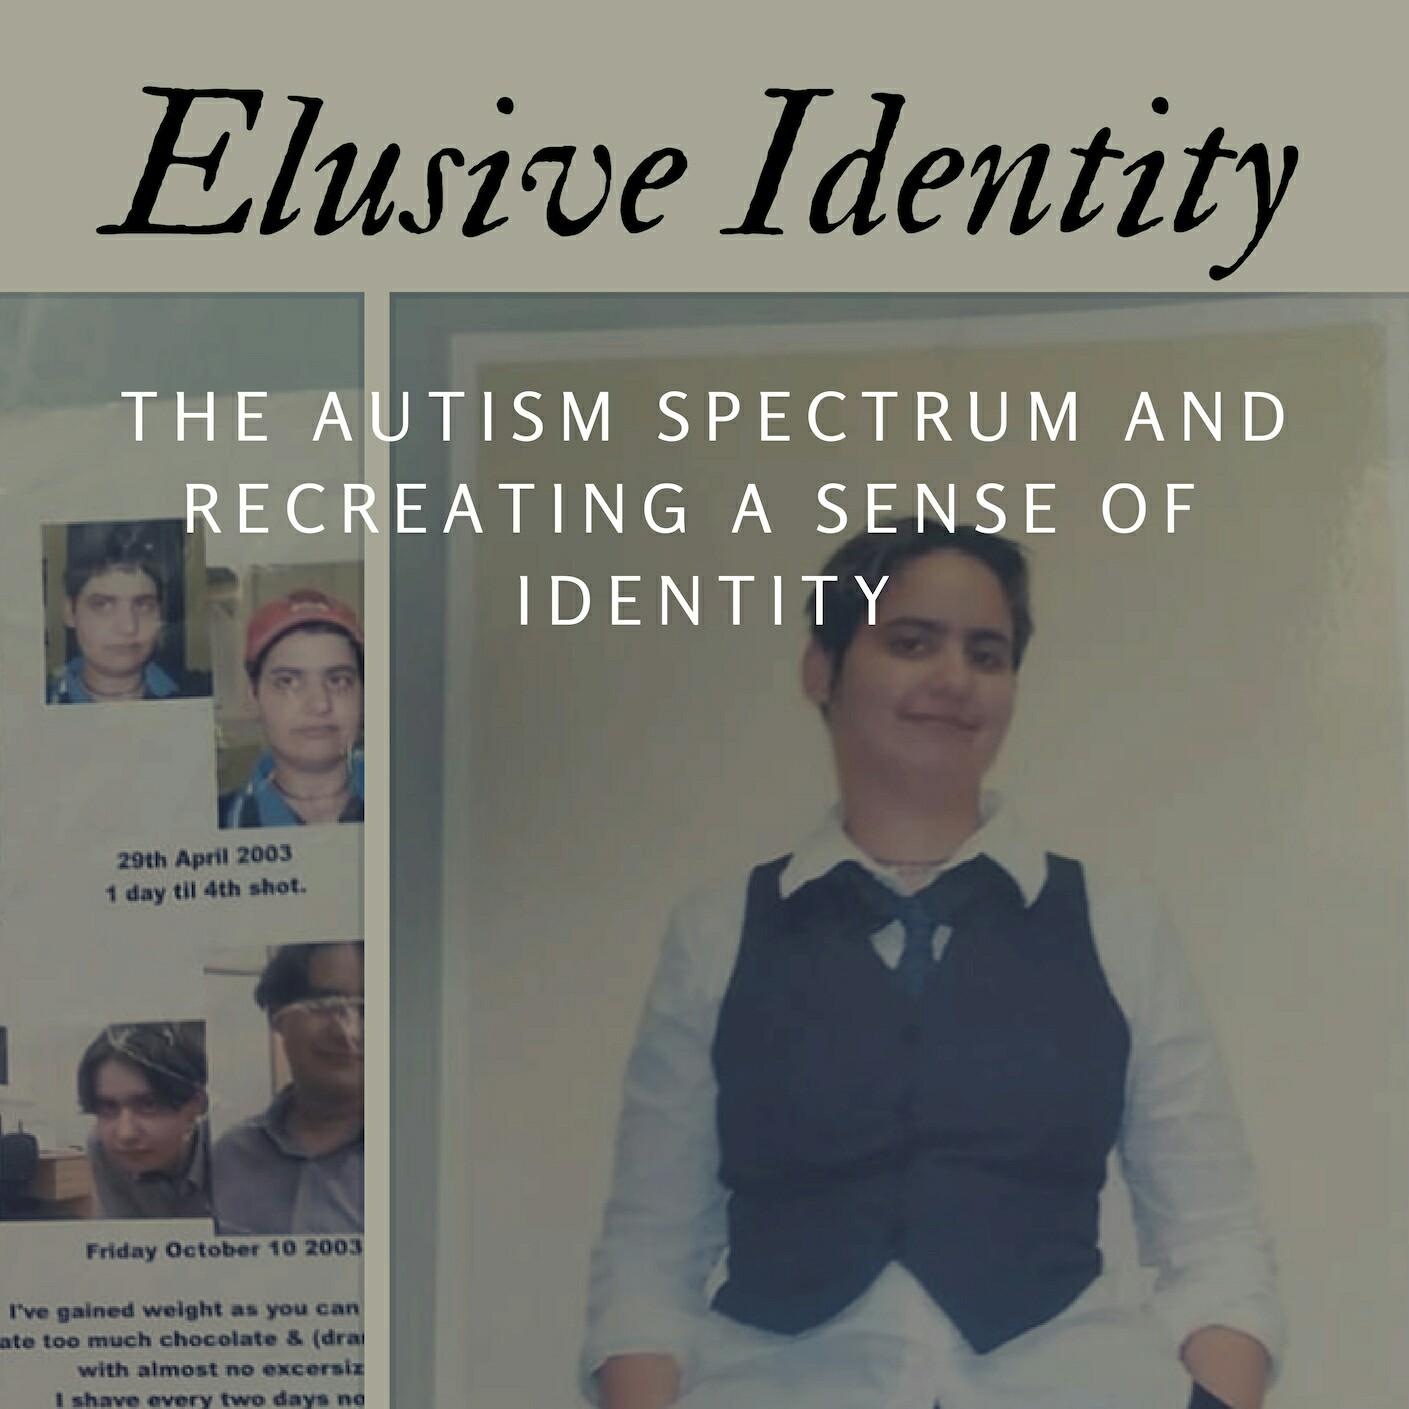 Chapter 5: Gender Dysphoria (Elusive Identity)